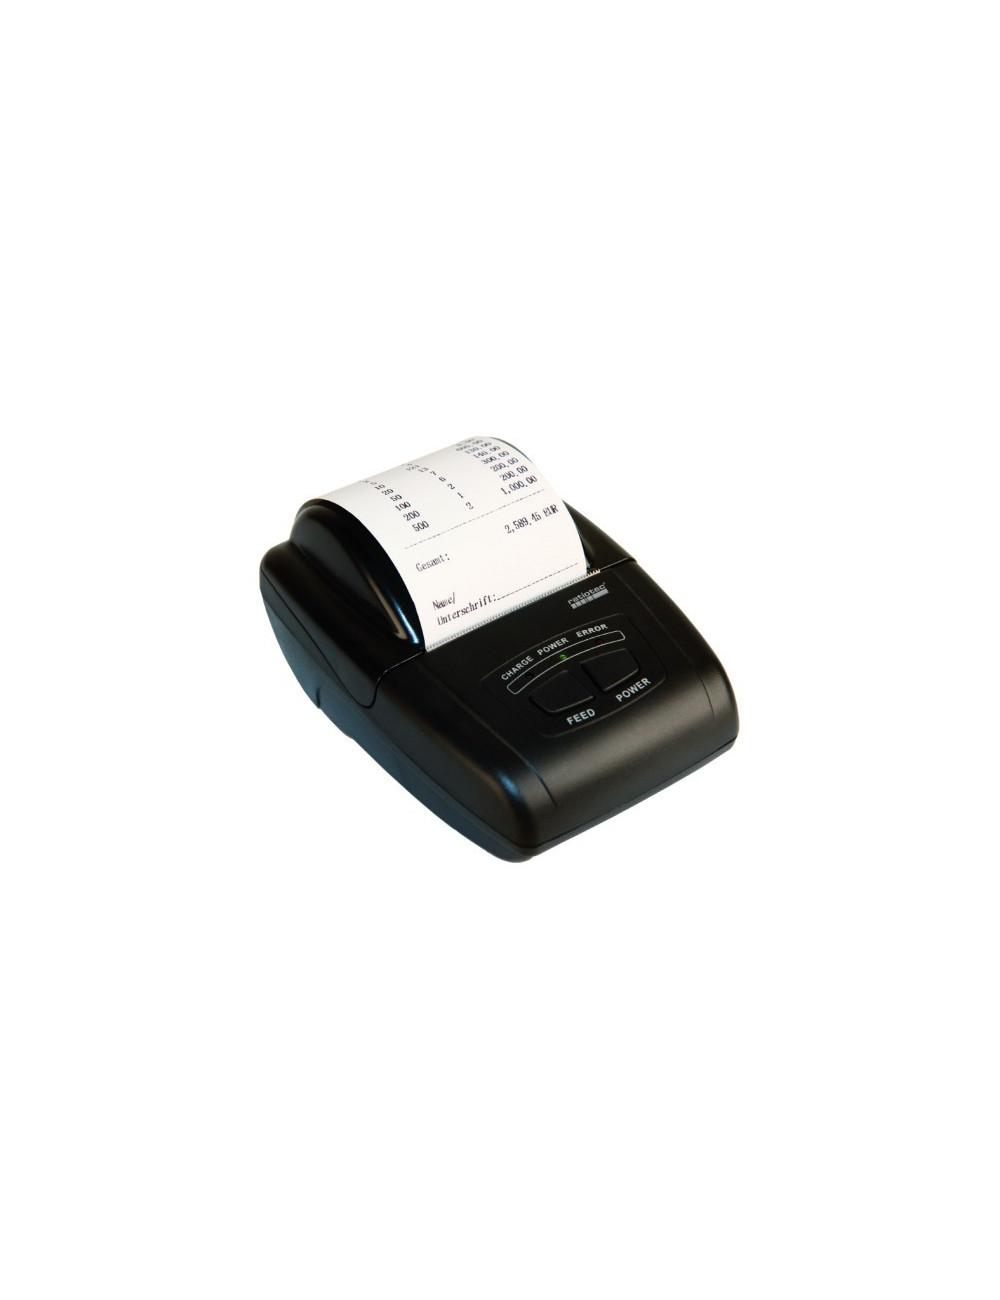 Imprimante Thermique RTP300